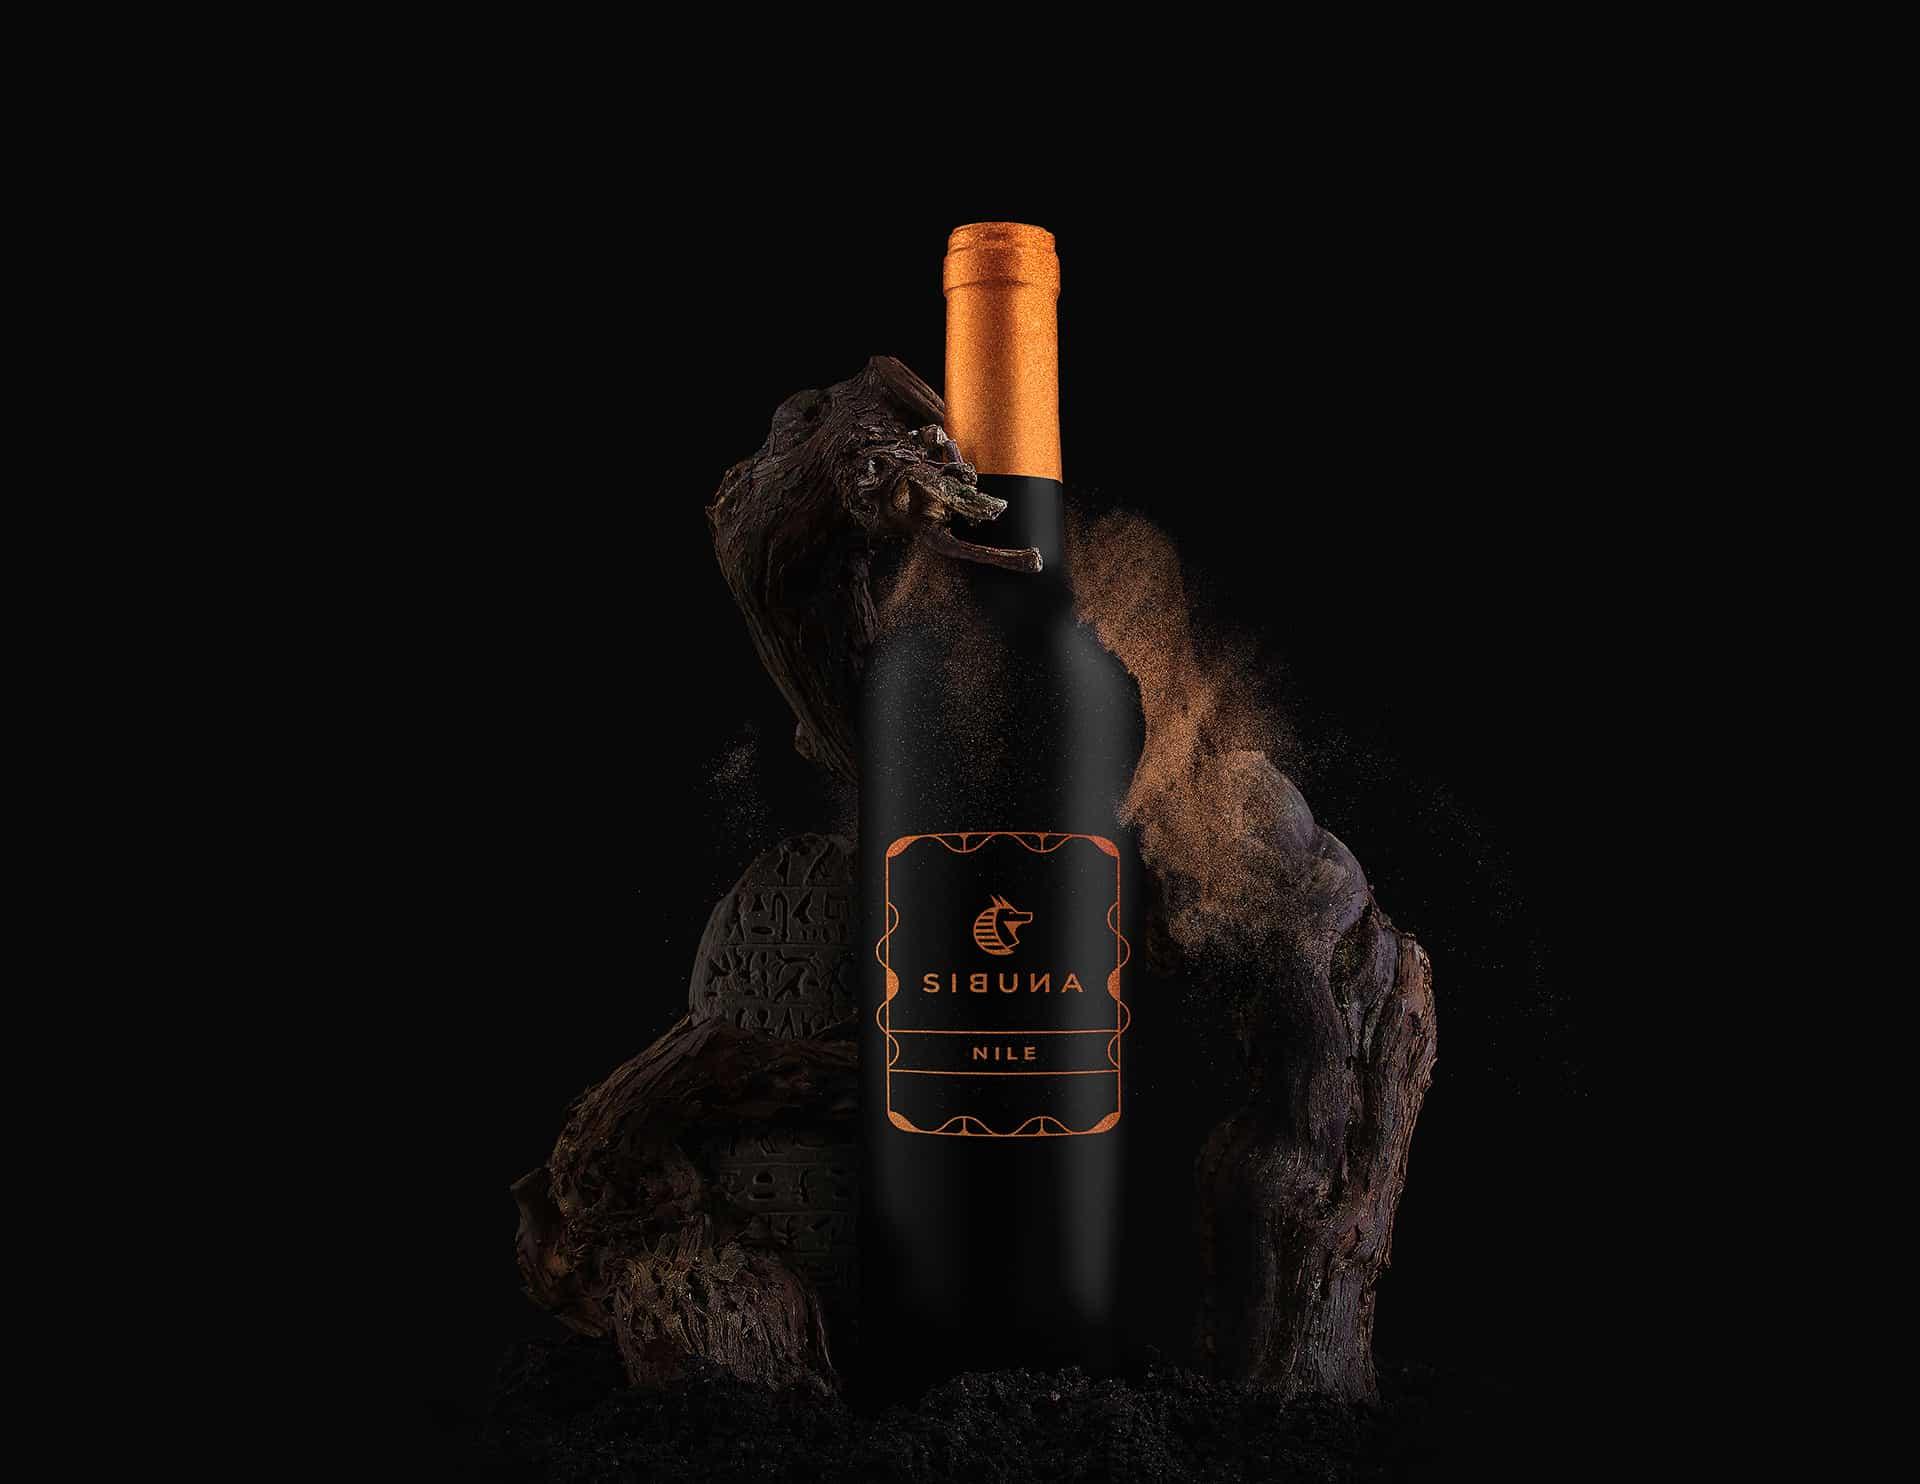 Sibuna Winery - Visual Identity